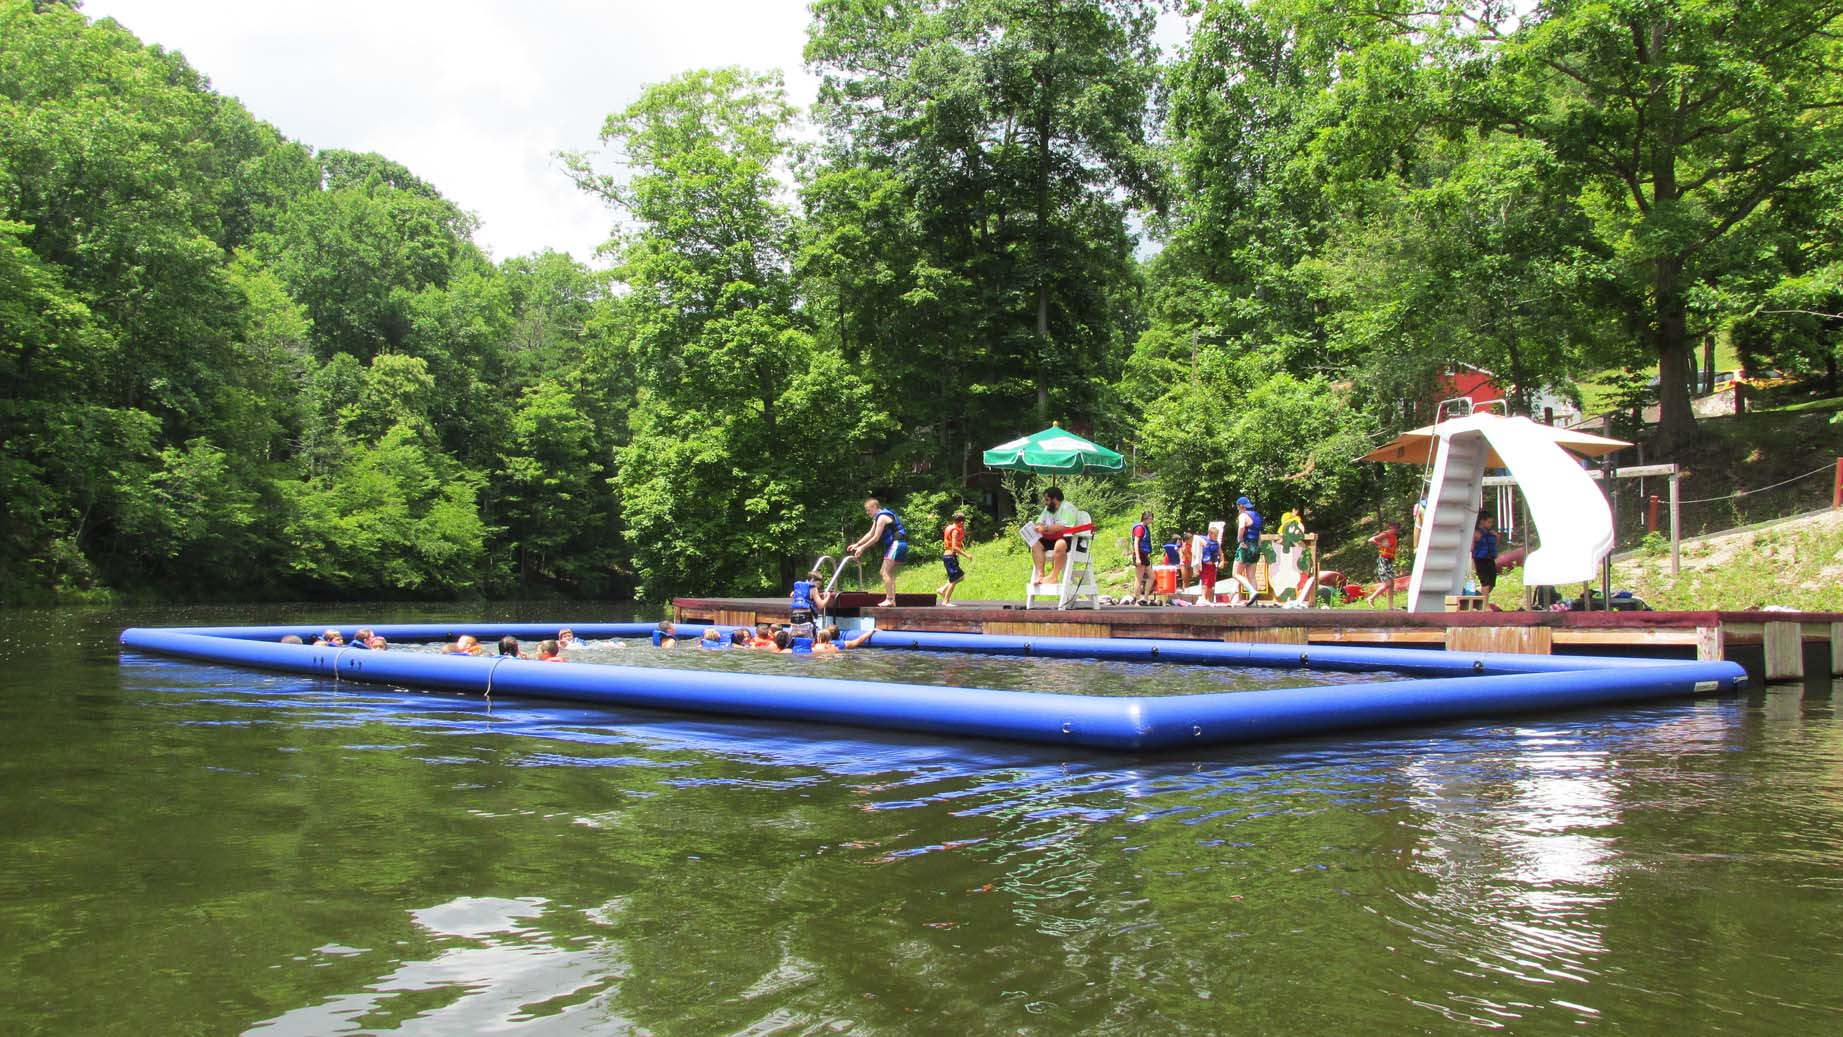 Waterside resort safe swimming area